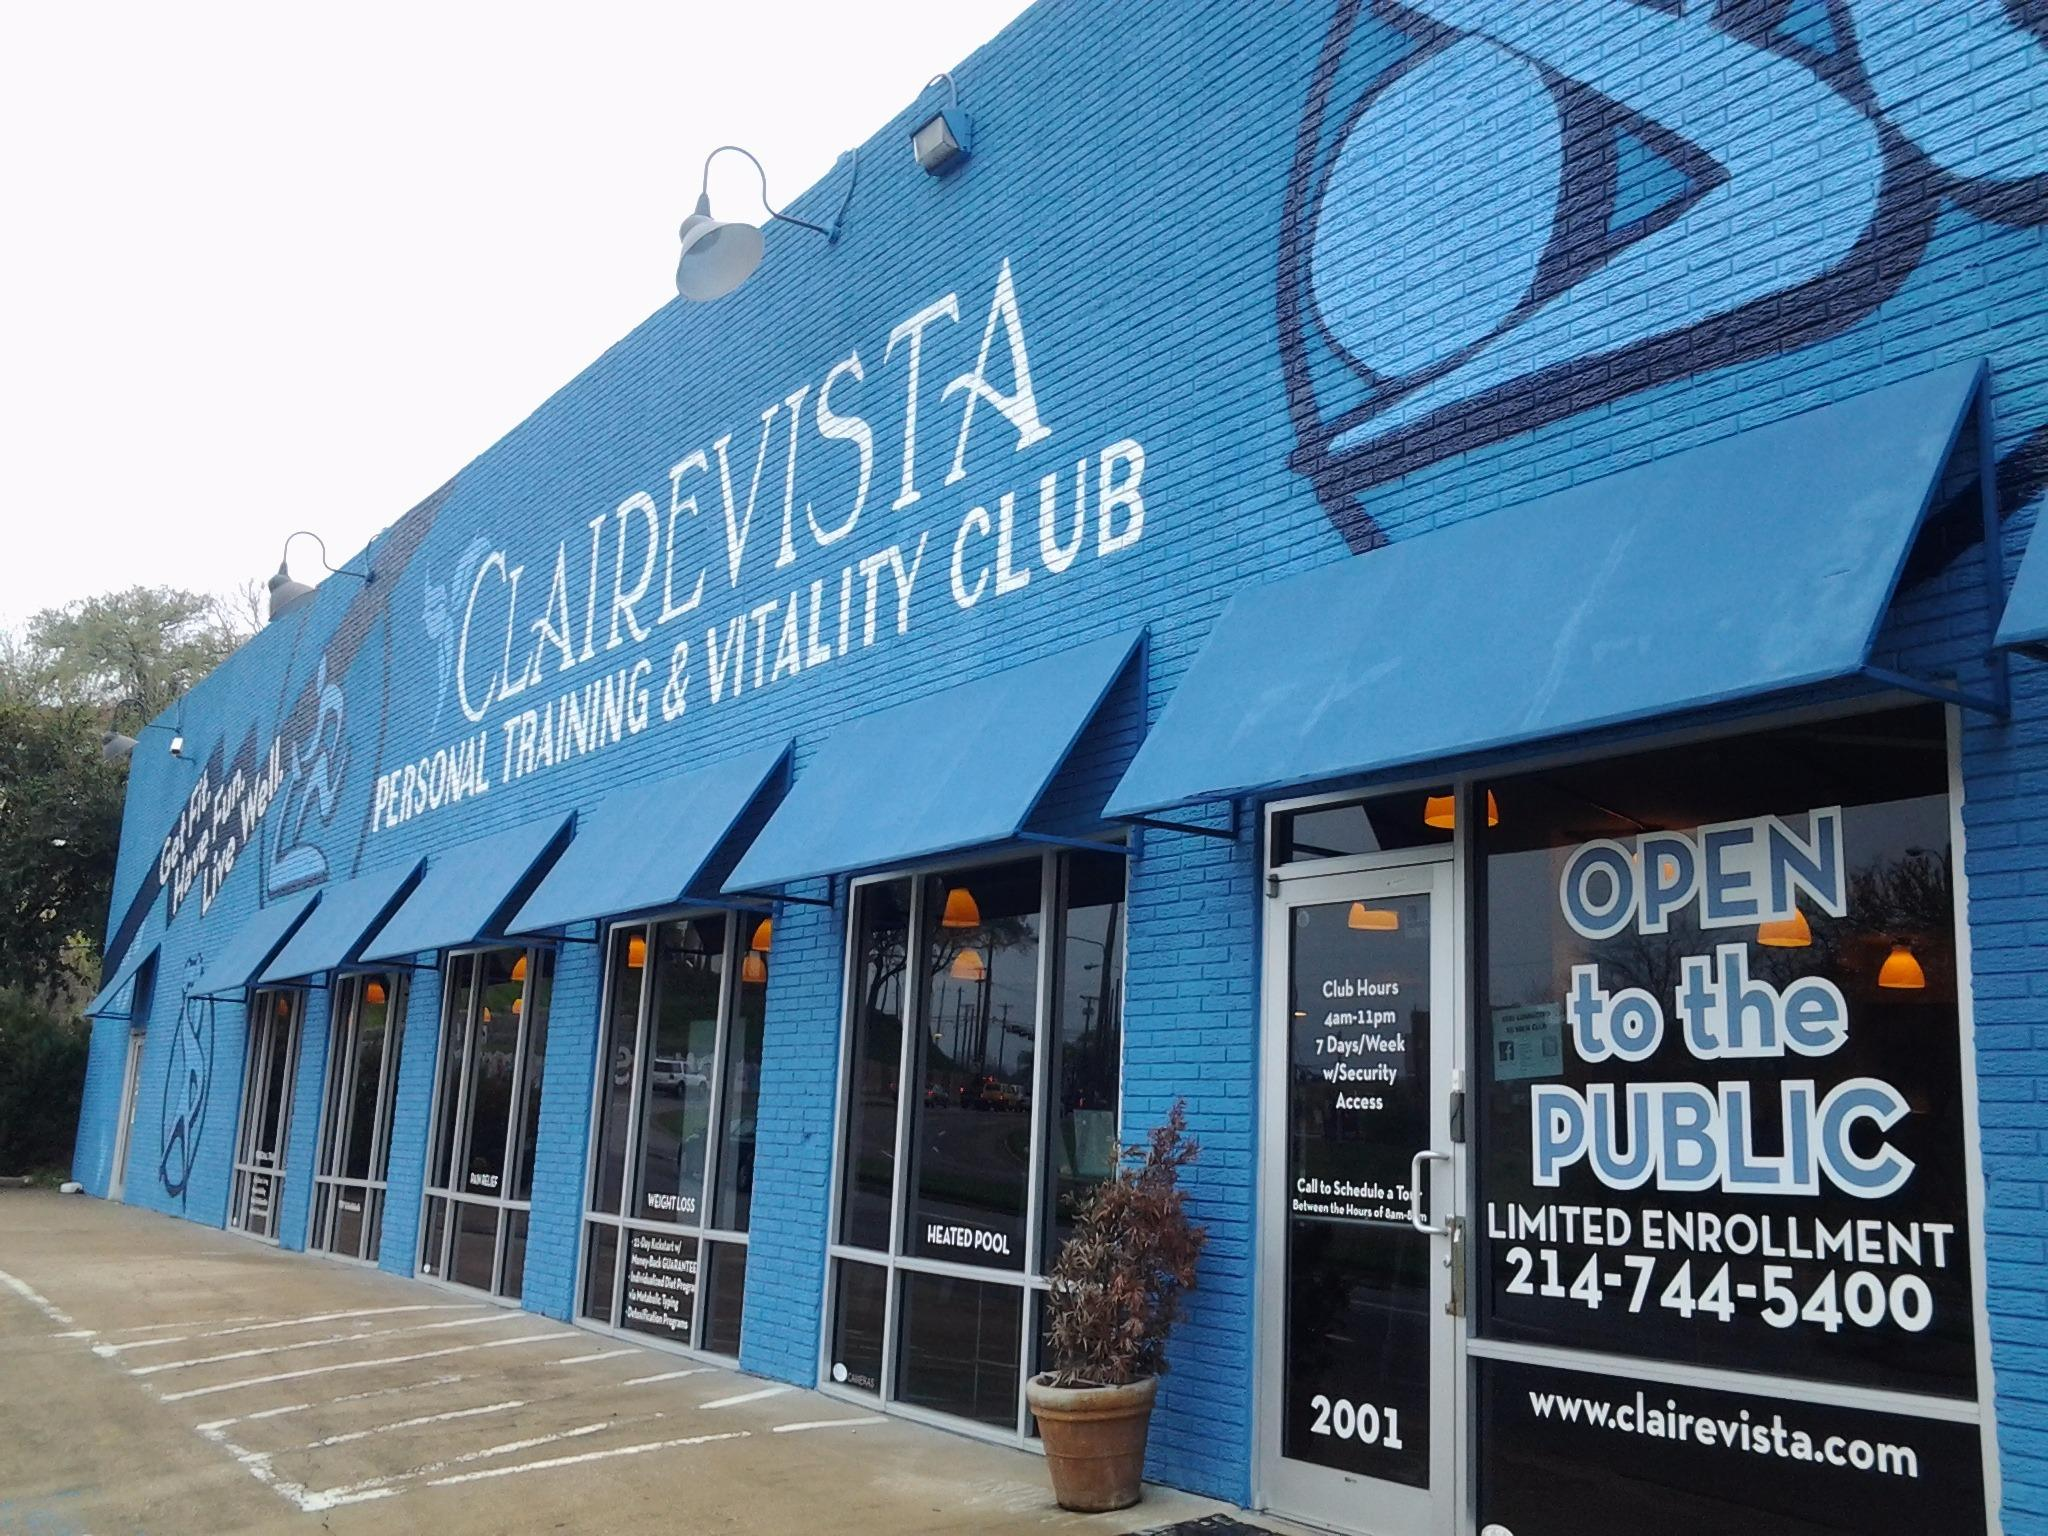 Clairevista Vitality Club